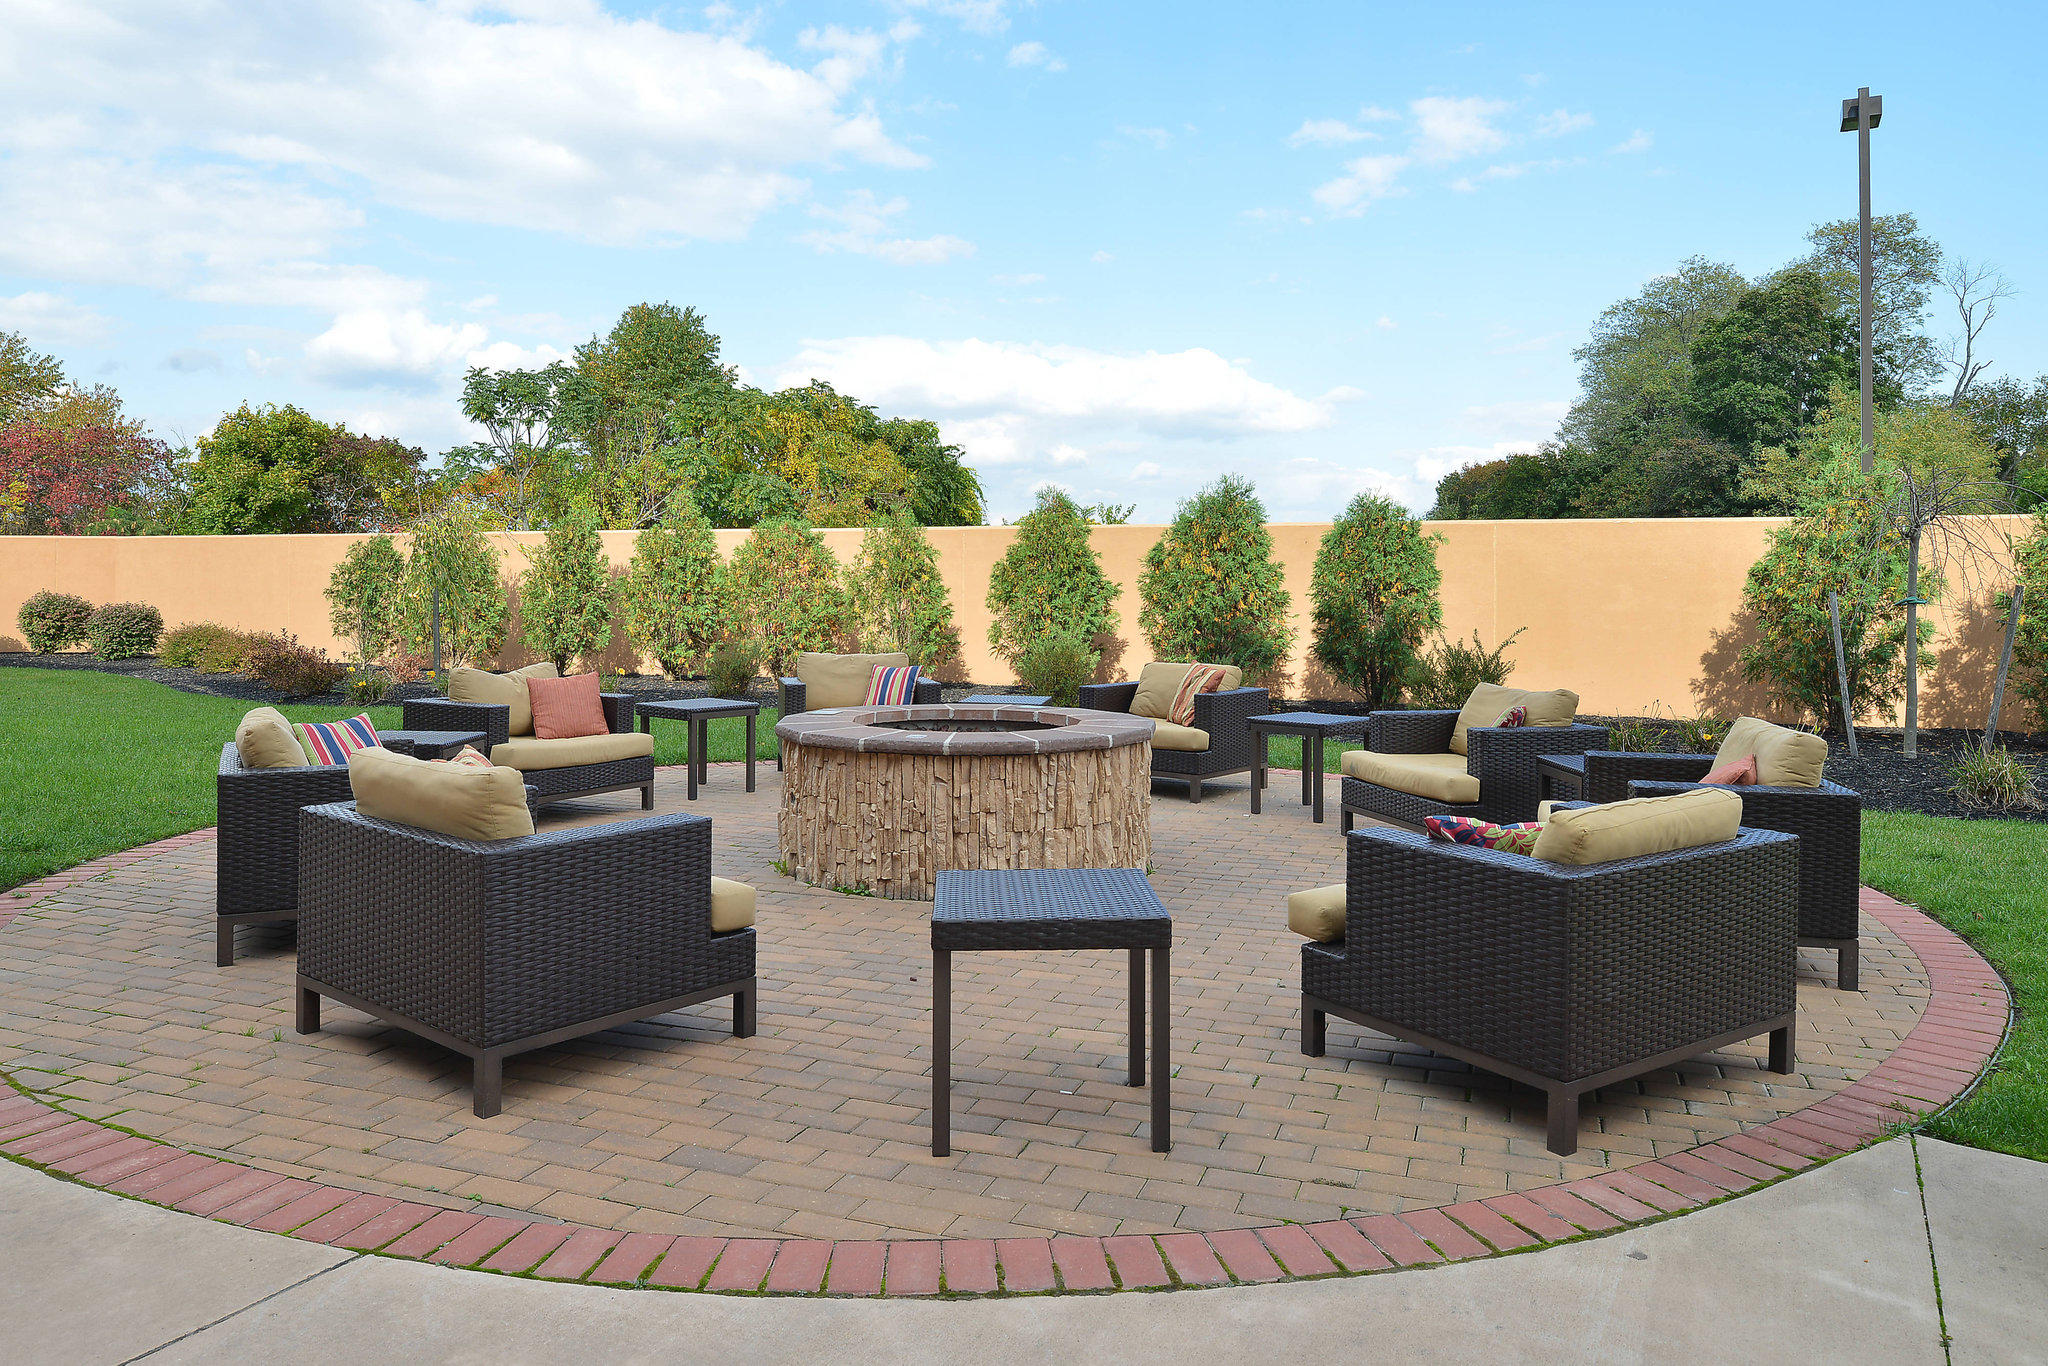 Courtyard by Marriott Burlington Mt. Holly/Westampton